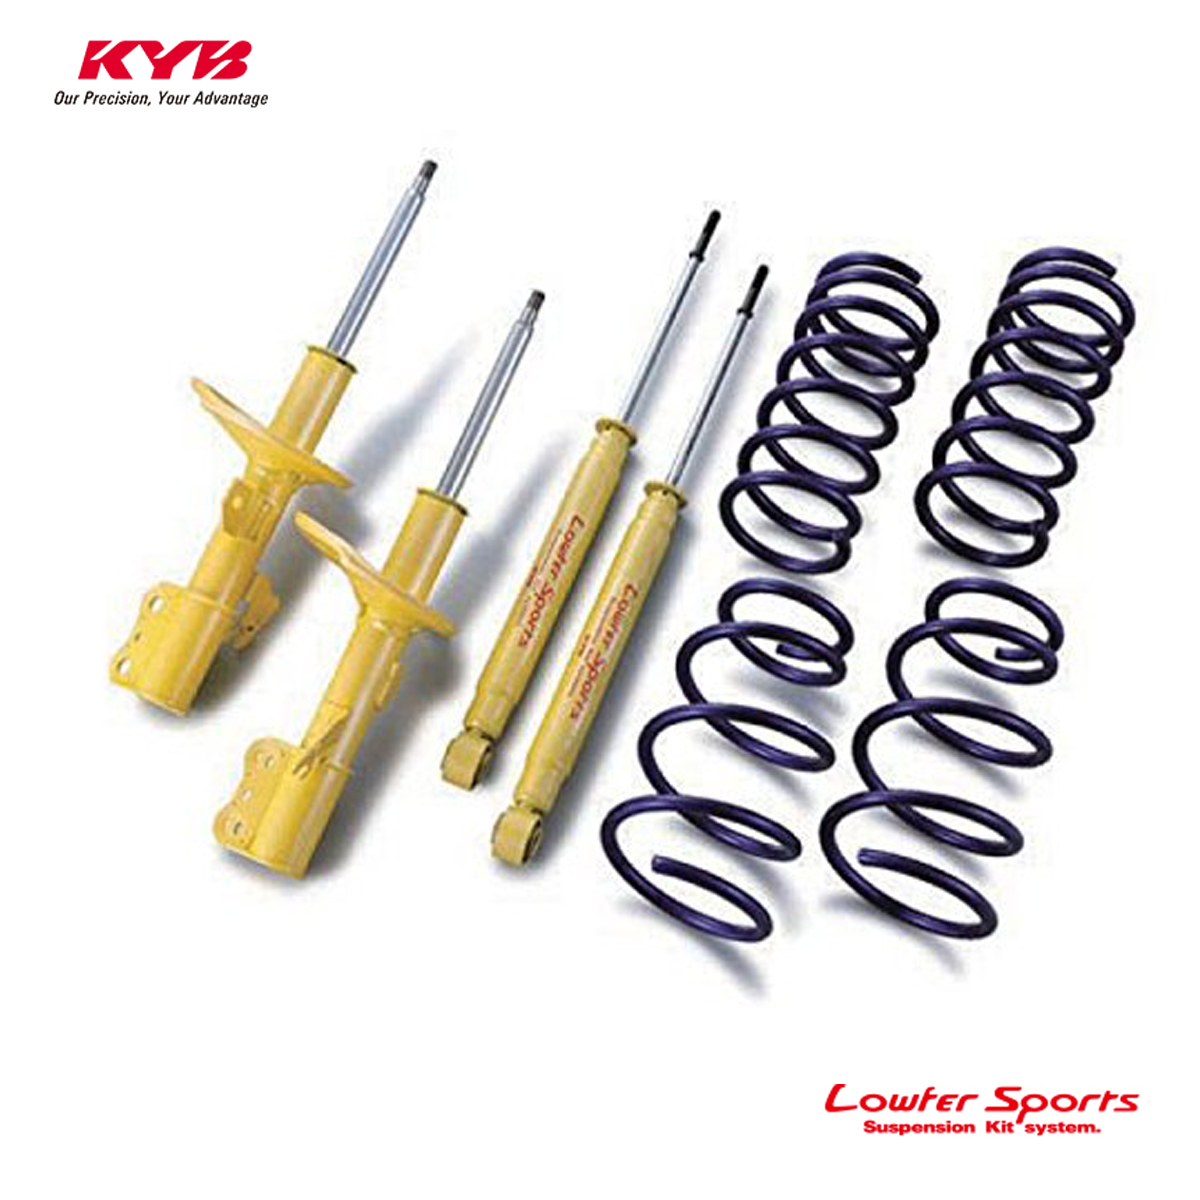 KYB カヤバ ノア ZRR70G ショックアブソーバー サスペンションキット Lowfer Sports LKIT-ZRR70G 配送先条件有り